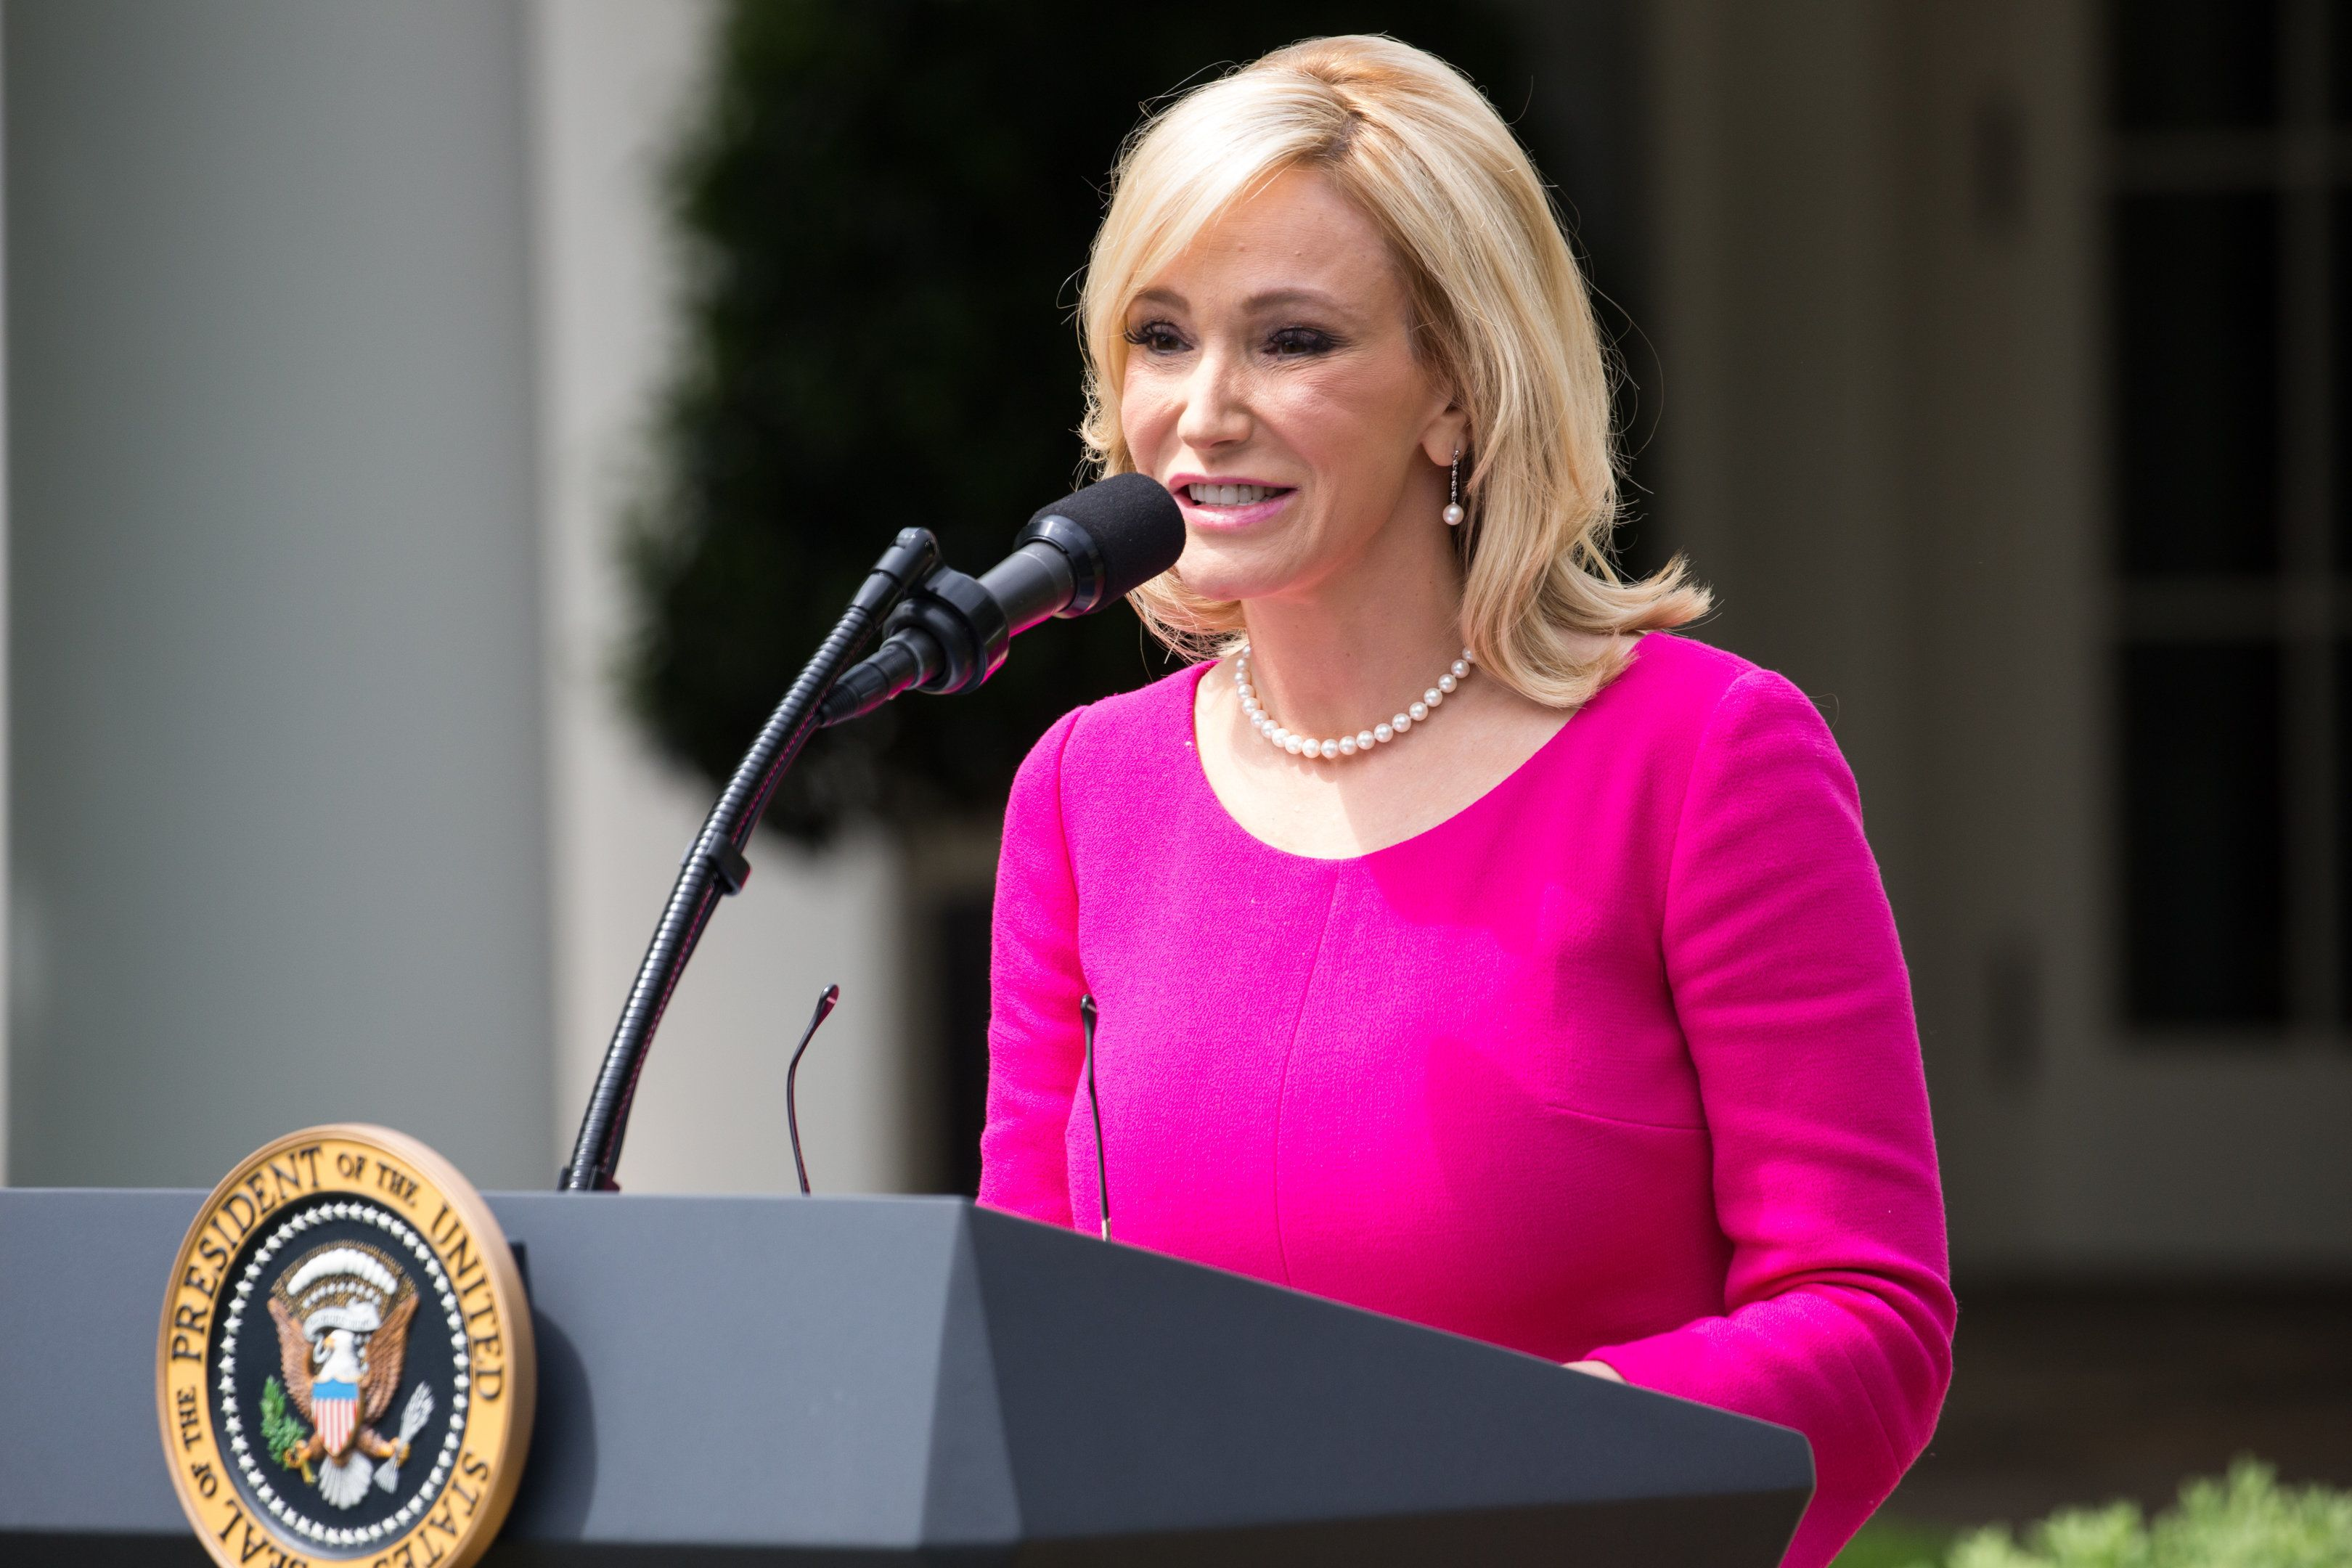 Paula White, aspiritualadviser to the president, speaks at the National Day of Prayer ceremony at the White House